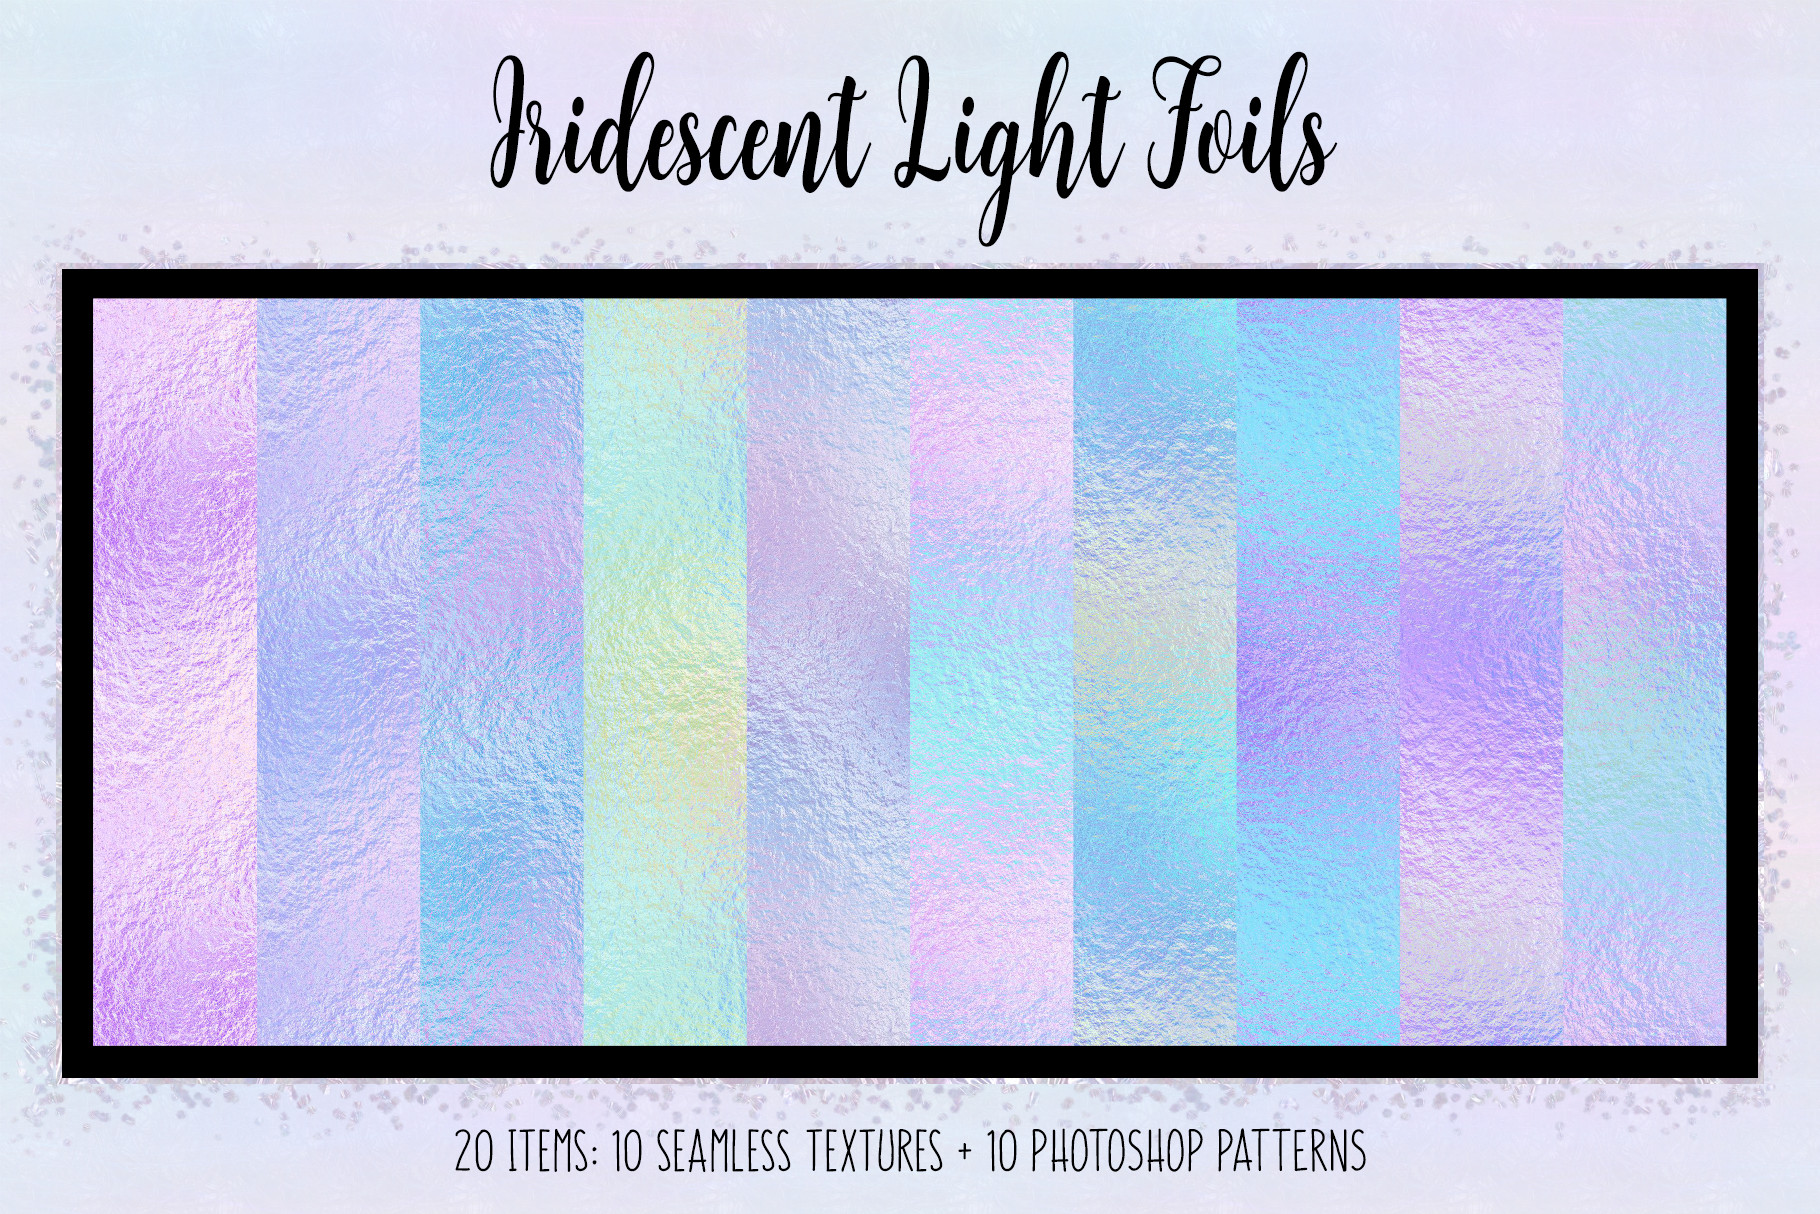 Iridescent Light Foils example image 1